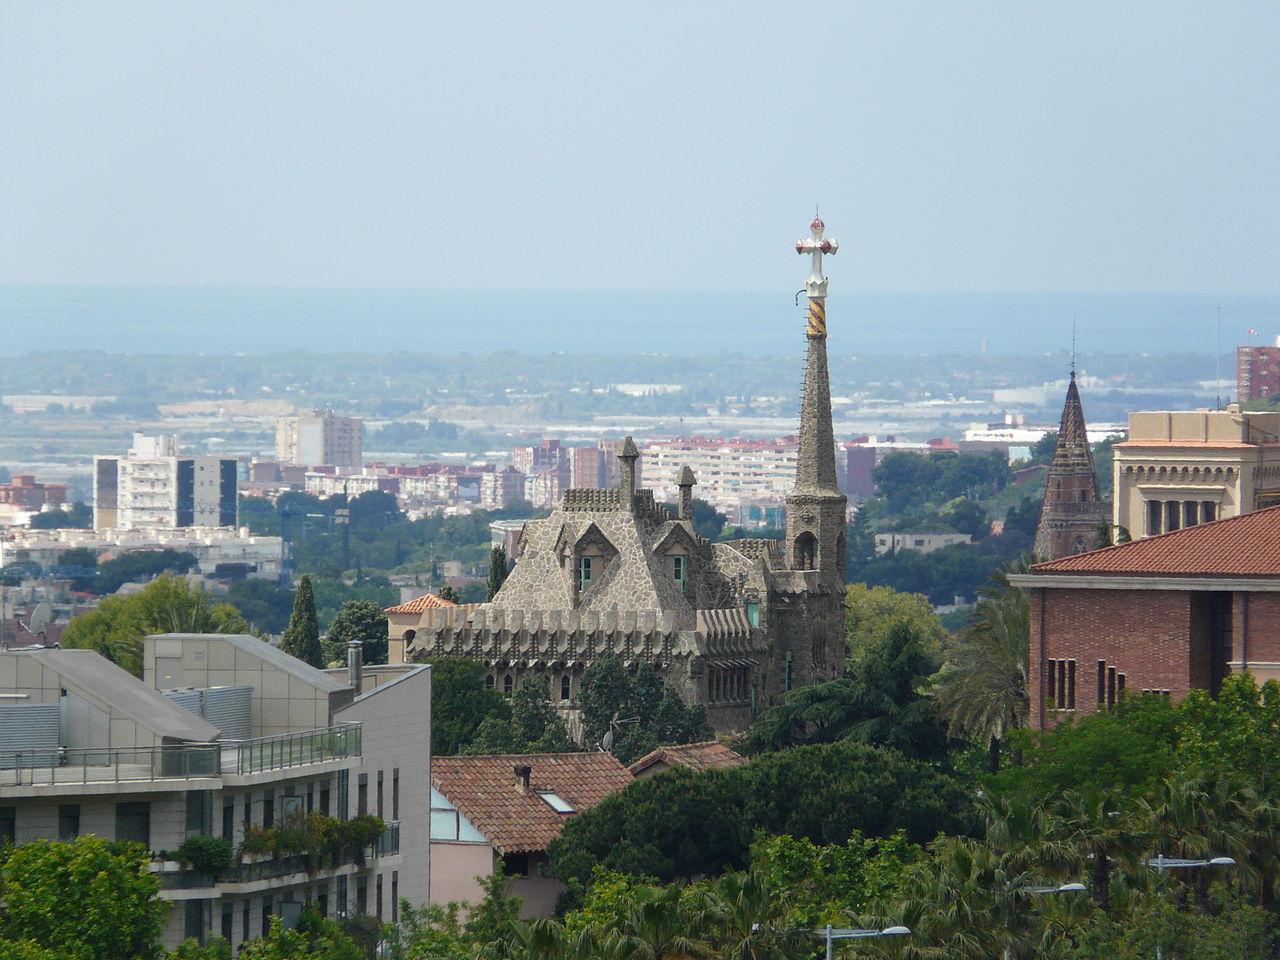 Вид на башню Бельесгуард, Барселона